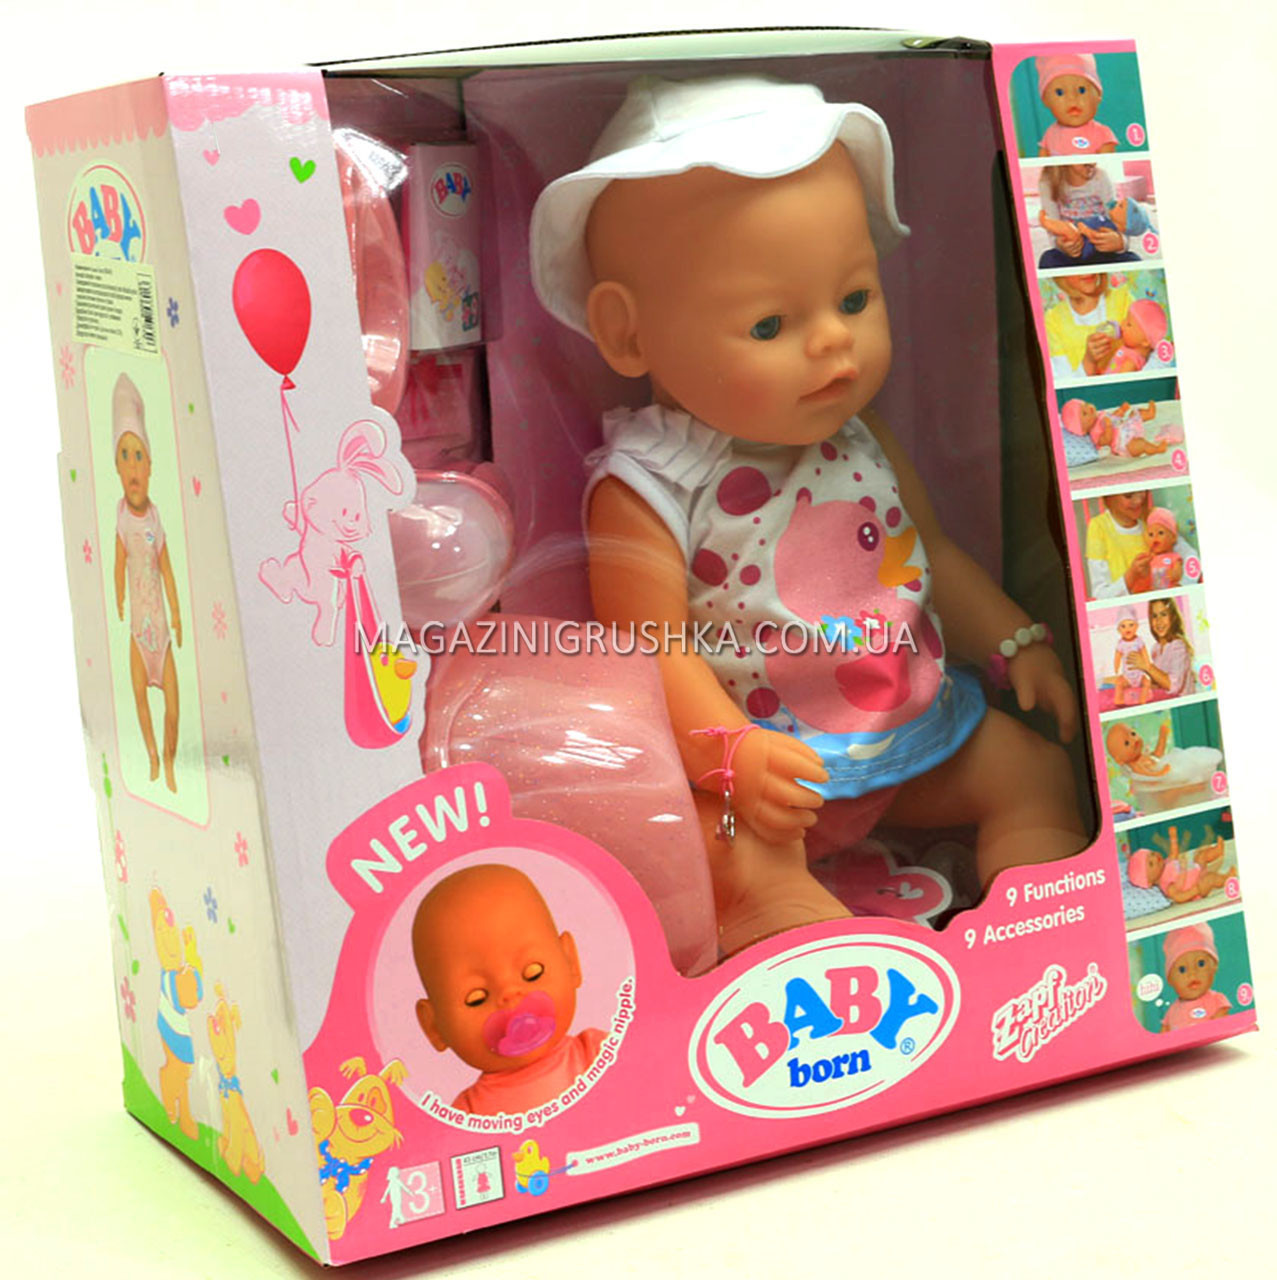 Интерактивная кукла Baby Born (беби бон). Пупс аналог с одеждой и аксессуарами 9 функций беби борн 8006-462